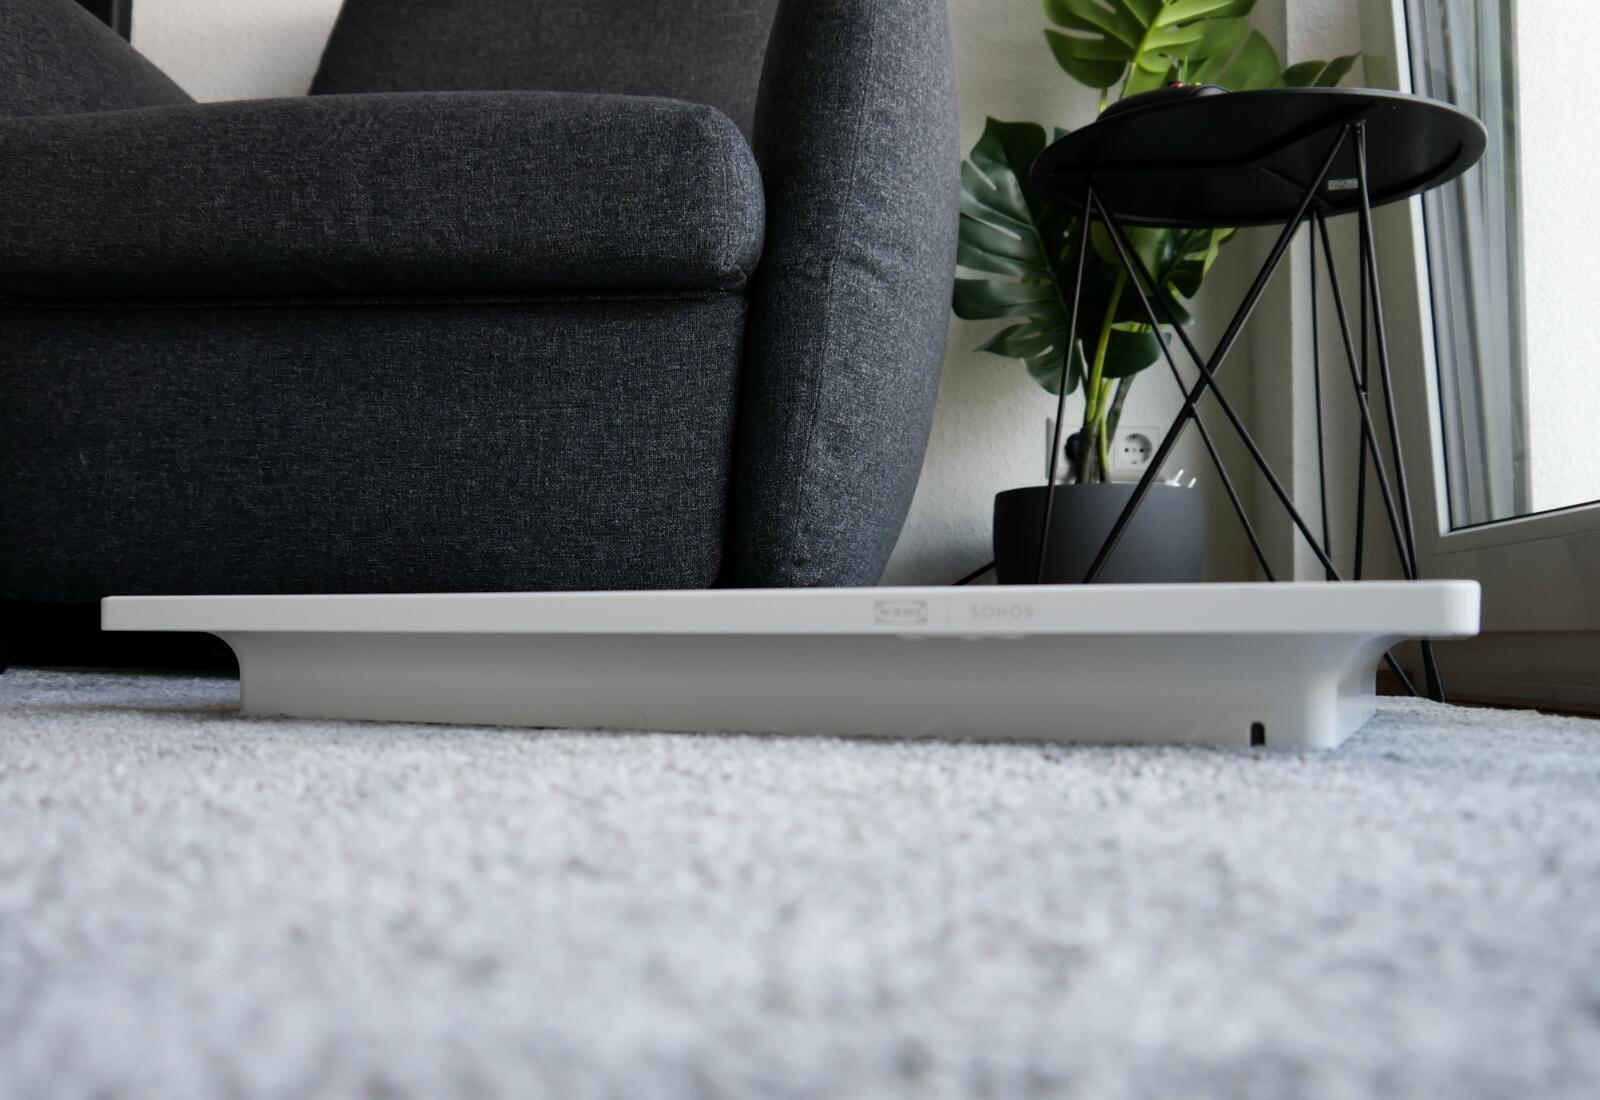 Ikea Sonos Symfonisk Bild Rahmen Dicke